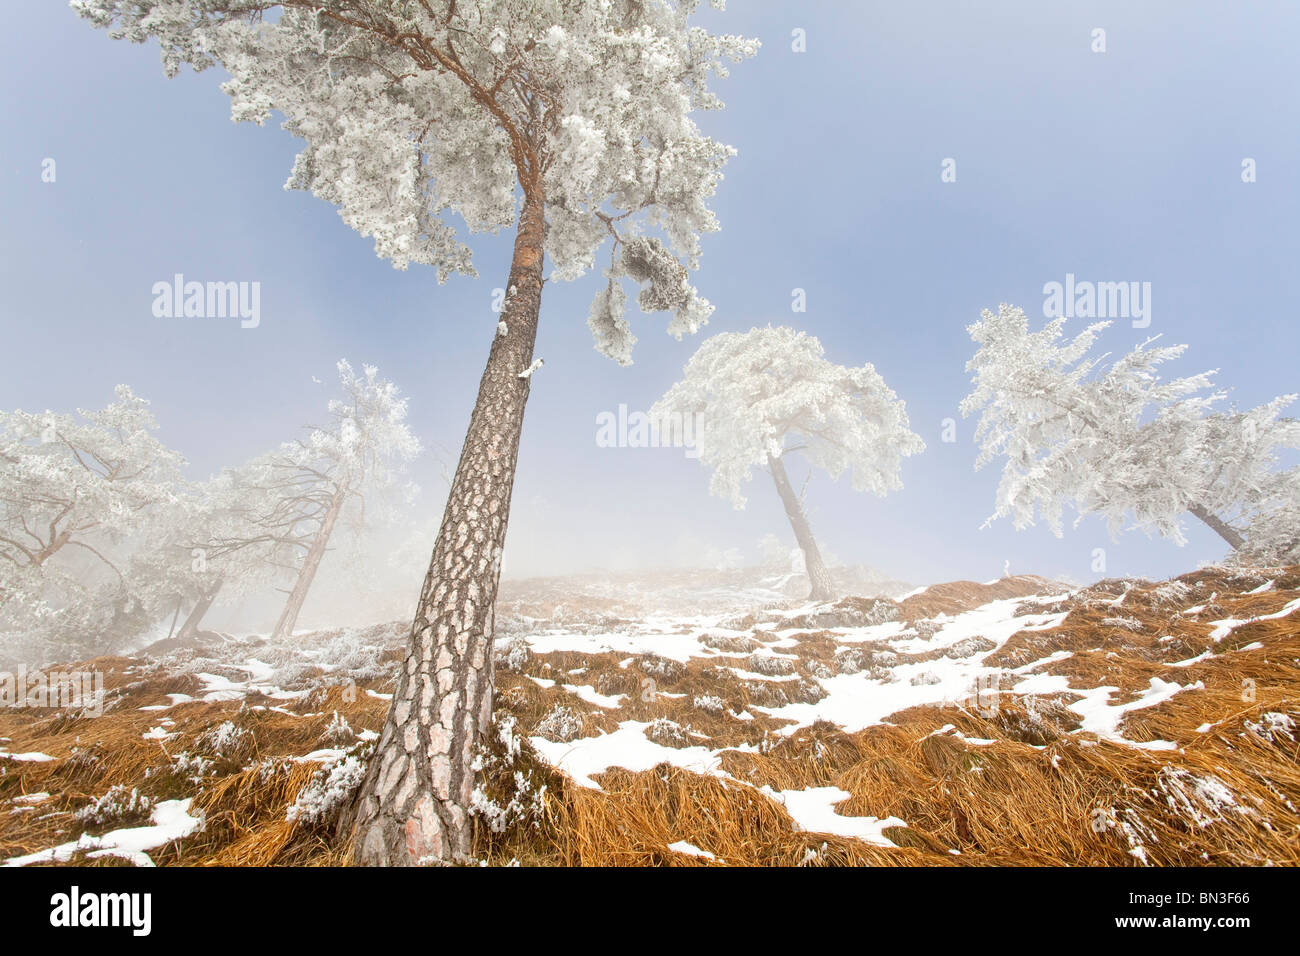 Verschneiten Kiefern (Pinus Sylvestris) am Untersberg, Berchtesgaden, Deutschland, niedrigen Winkel Bergblick Stockbild